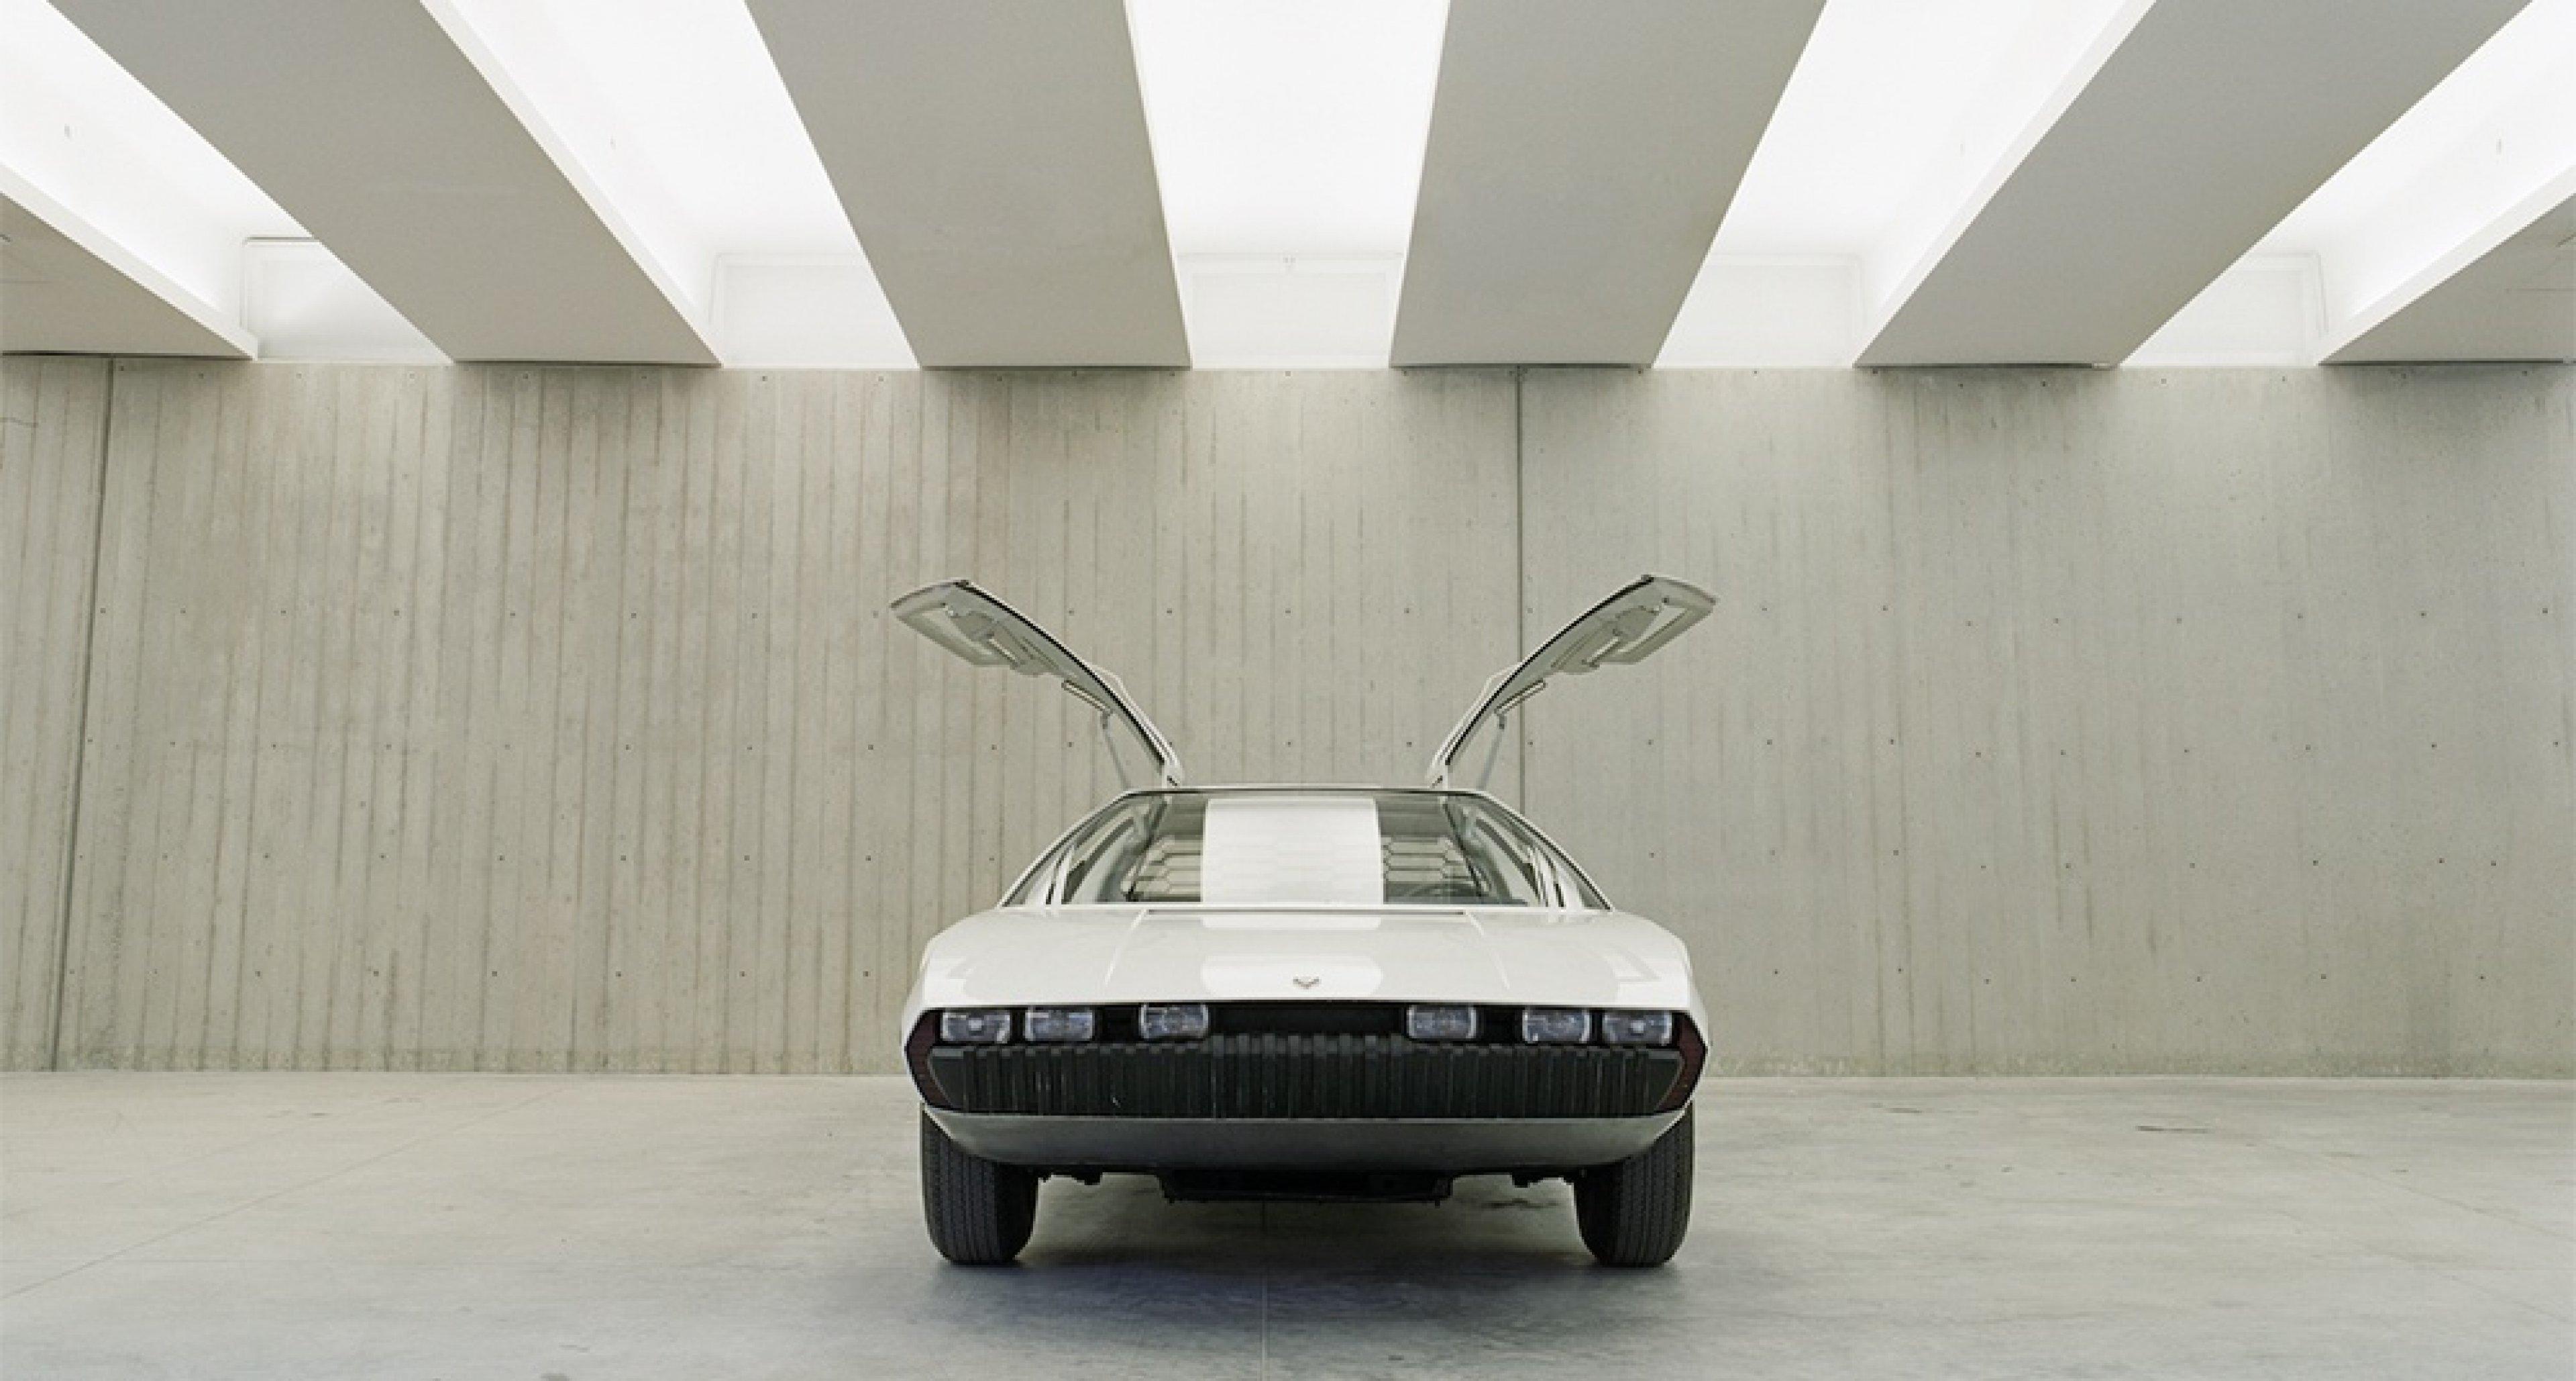 Lamborghini Marzal. Photo by Benedict Redgrove.